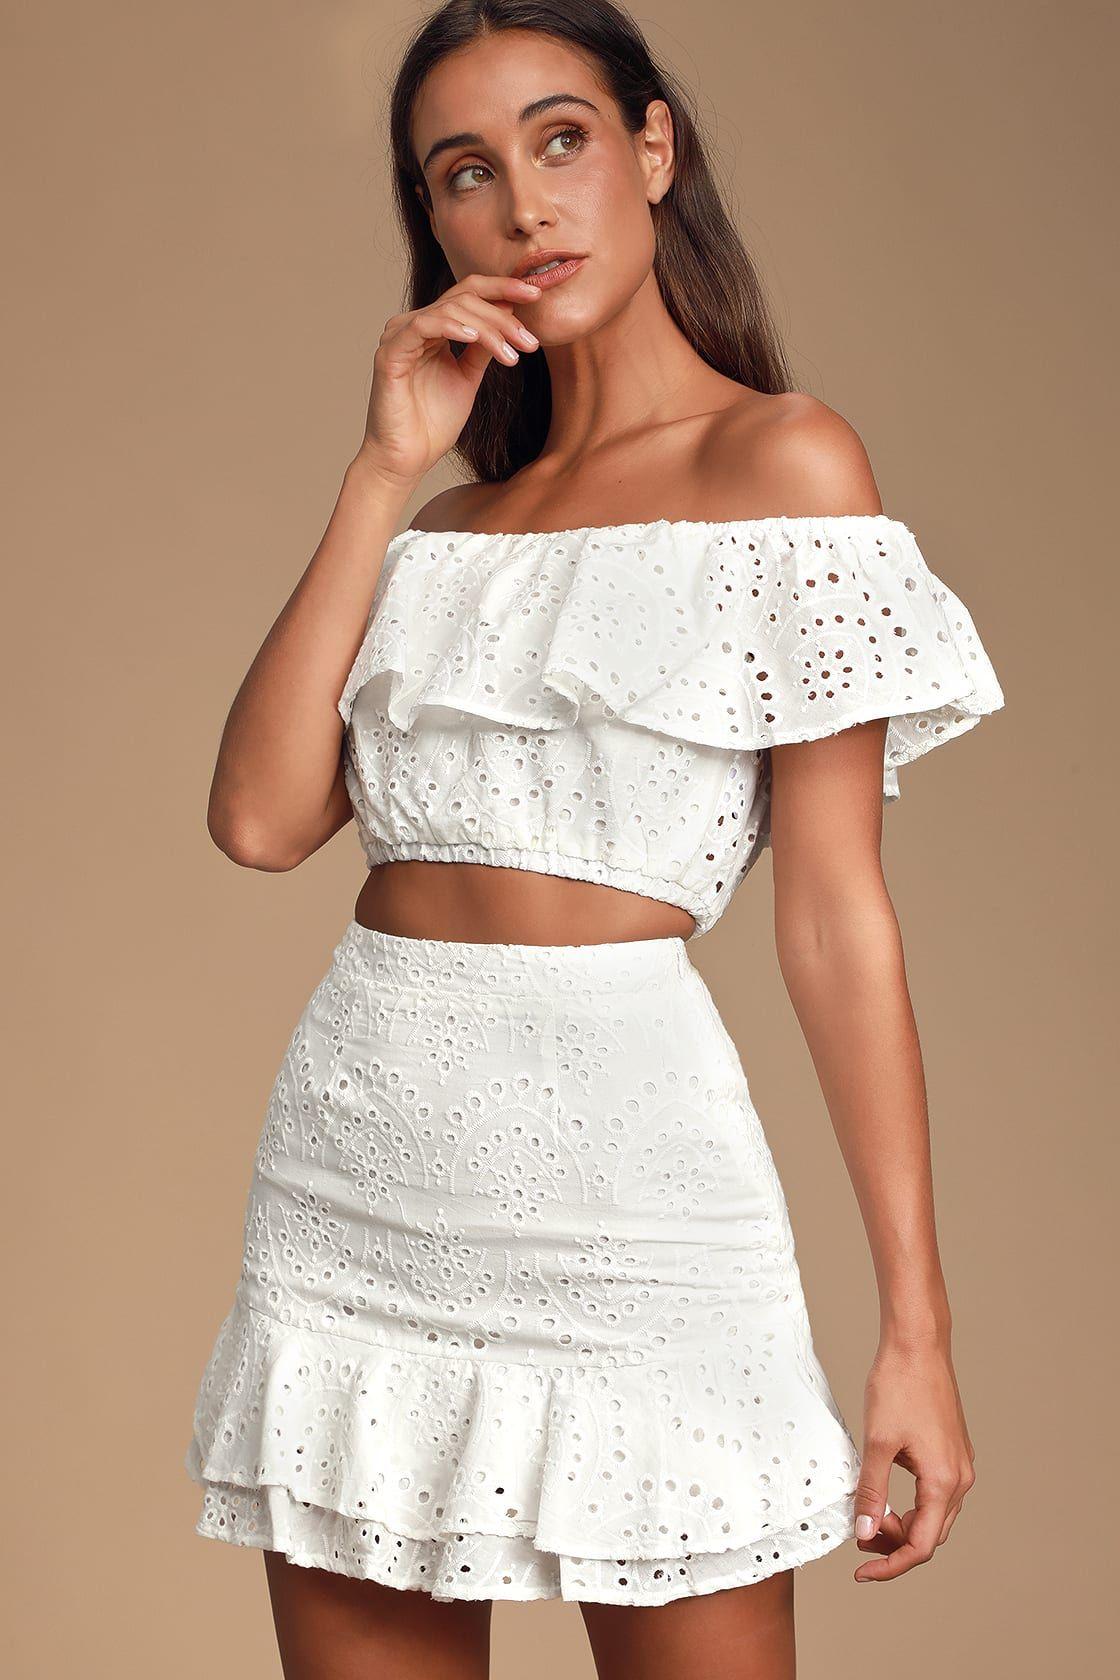 Playa de Isla White Eyelet Lace Ruffled Mini Skirt